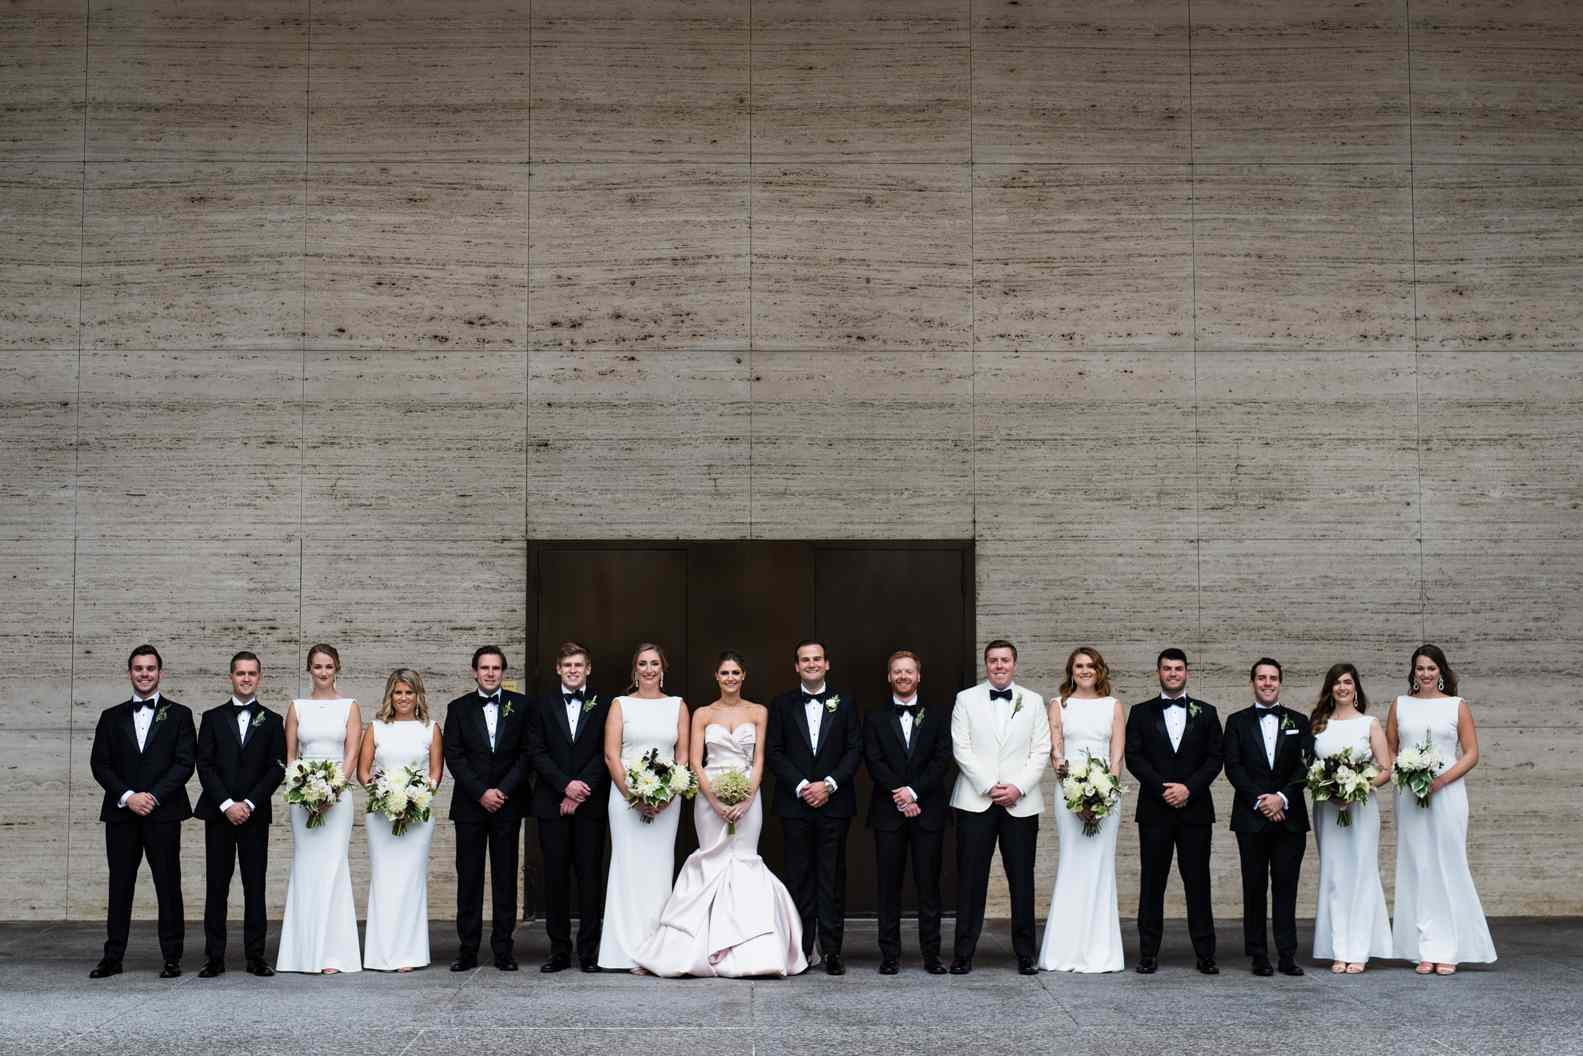 The wedding party portrait